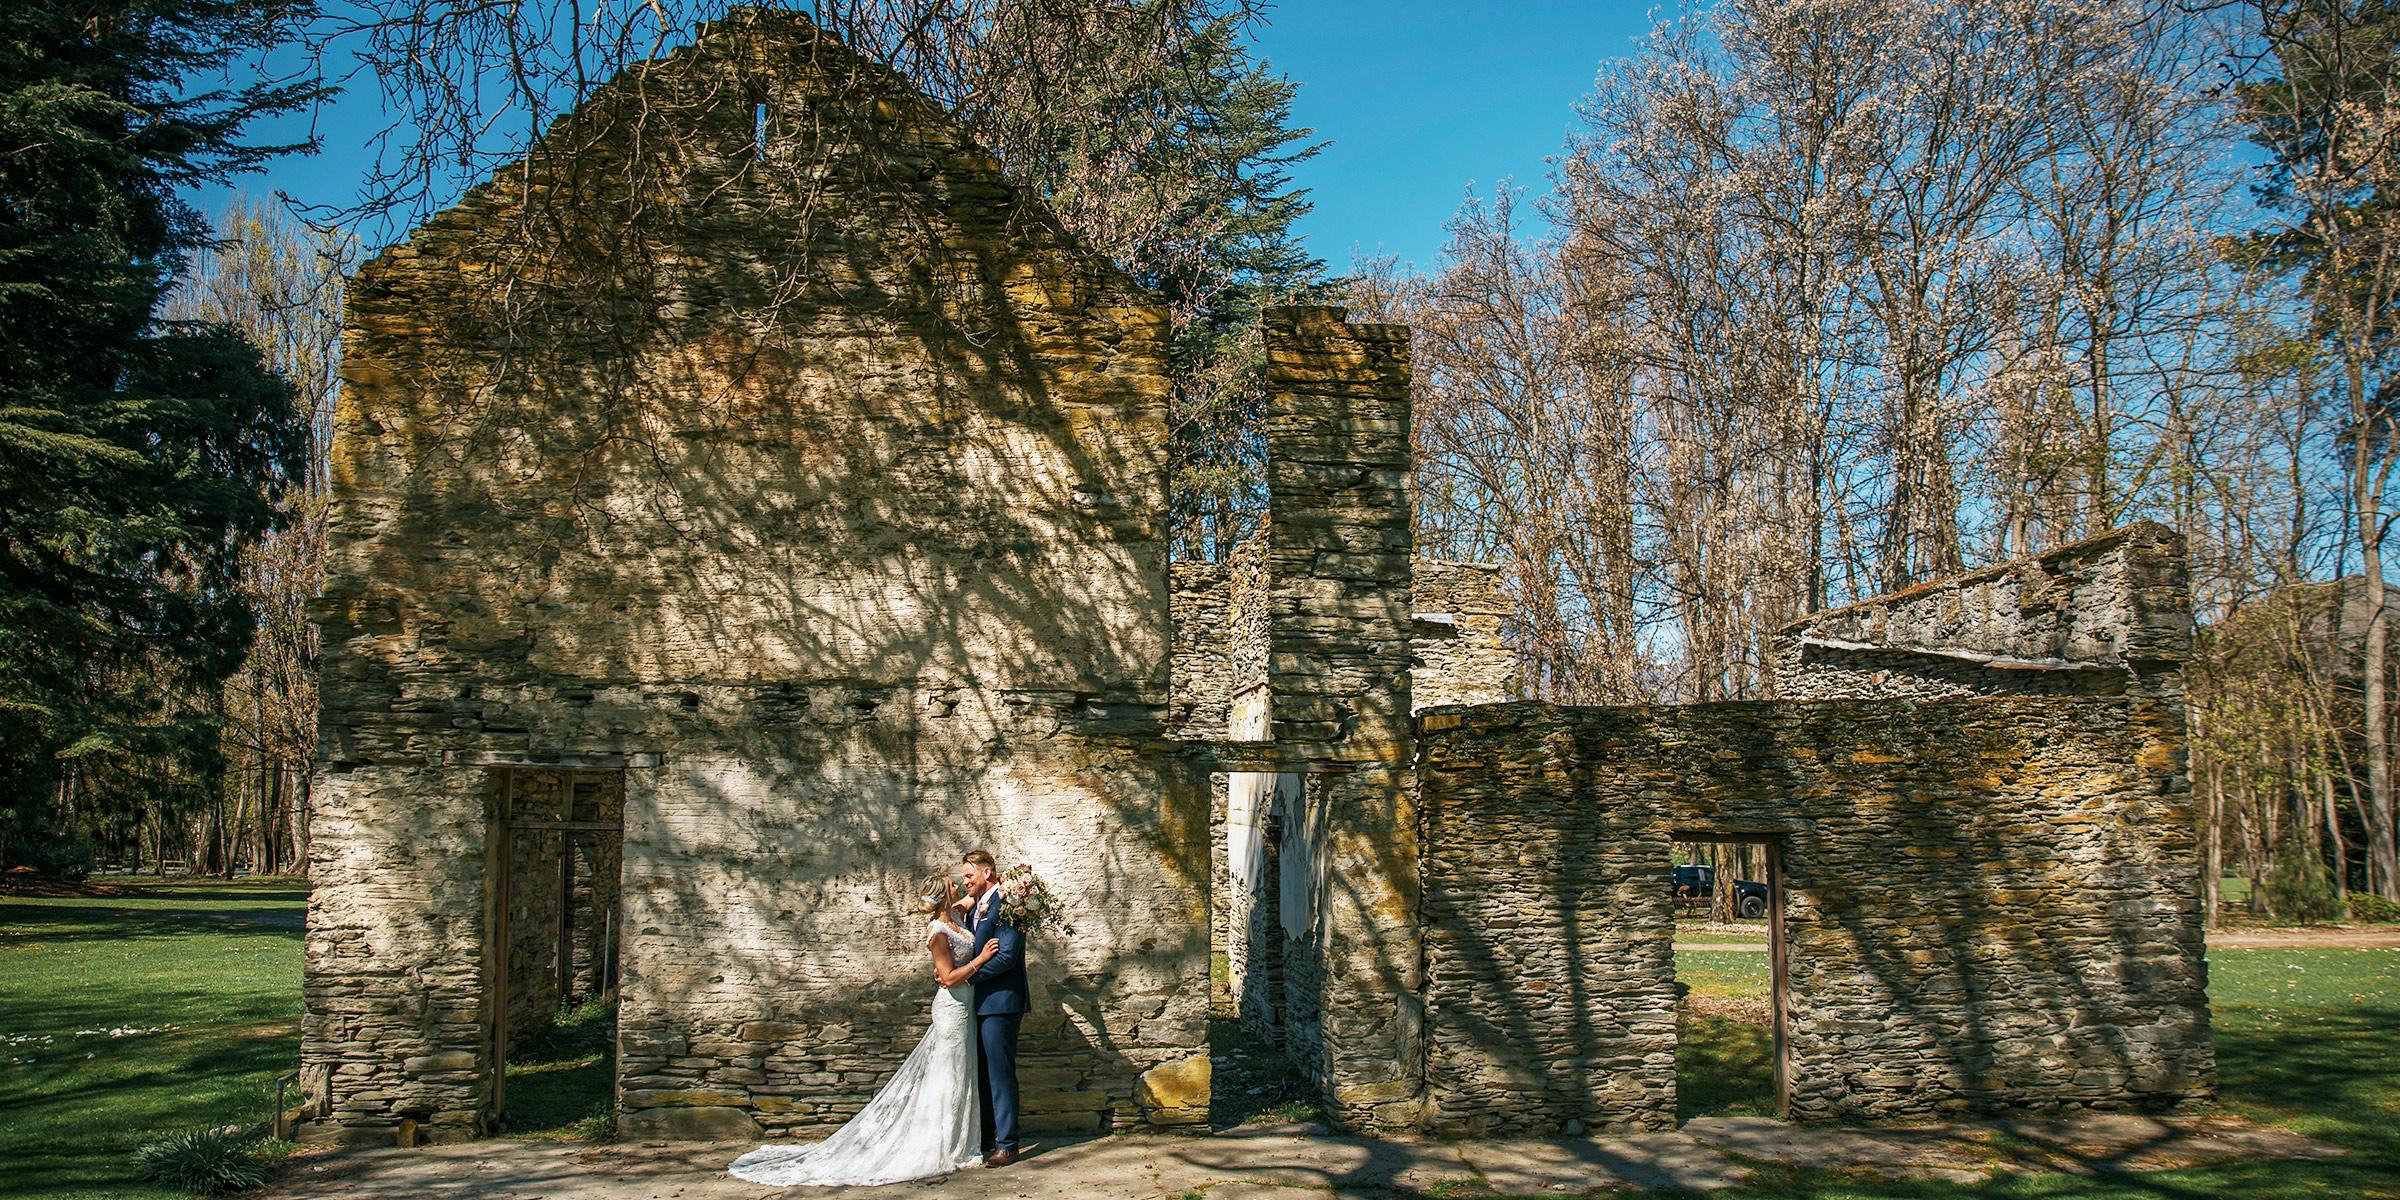 Thurlby Domain Elopement Wedding